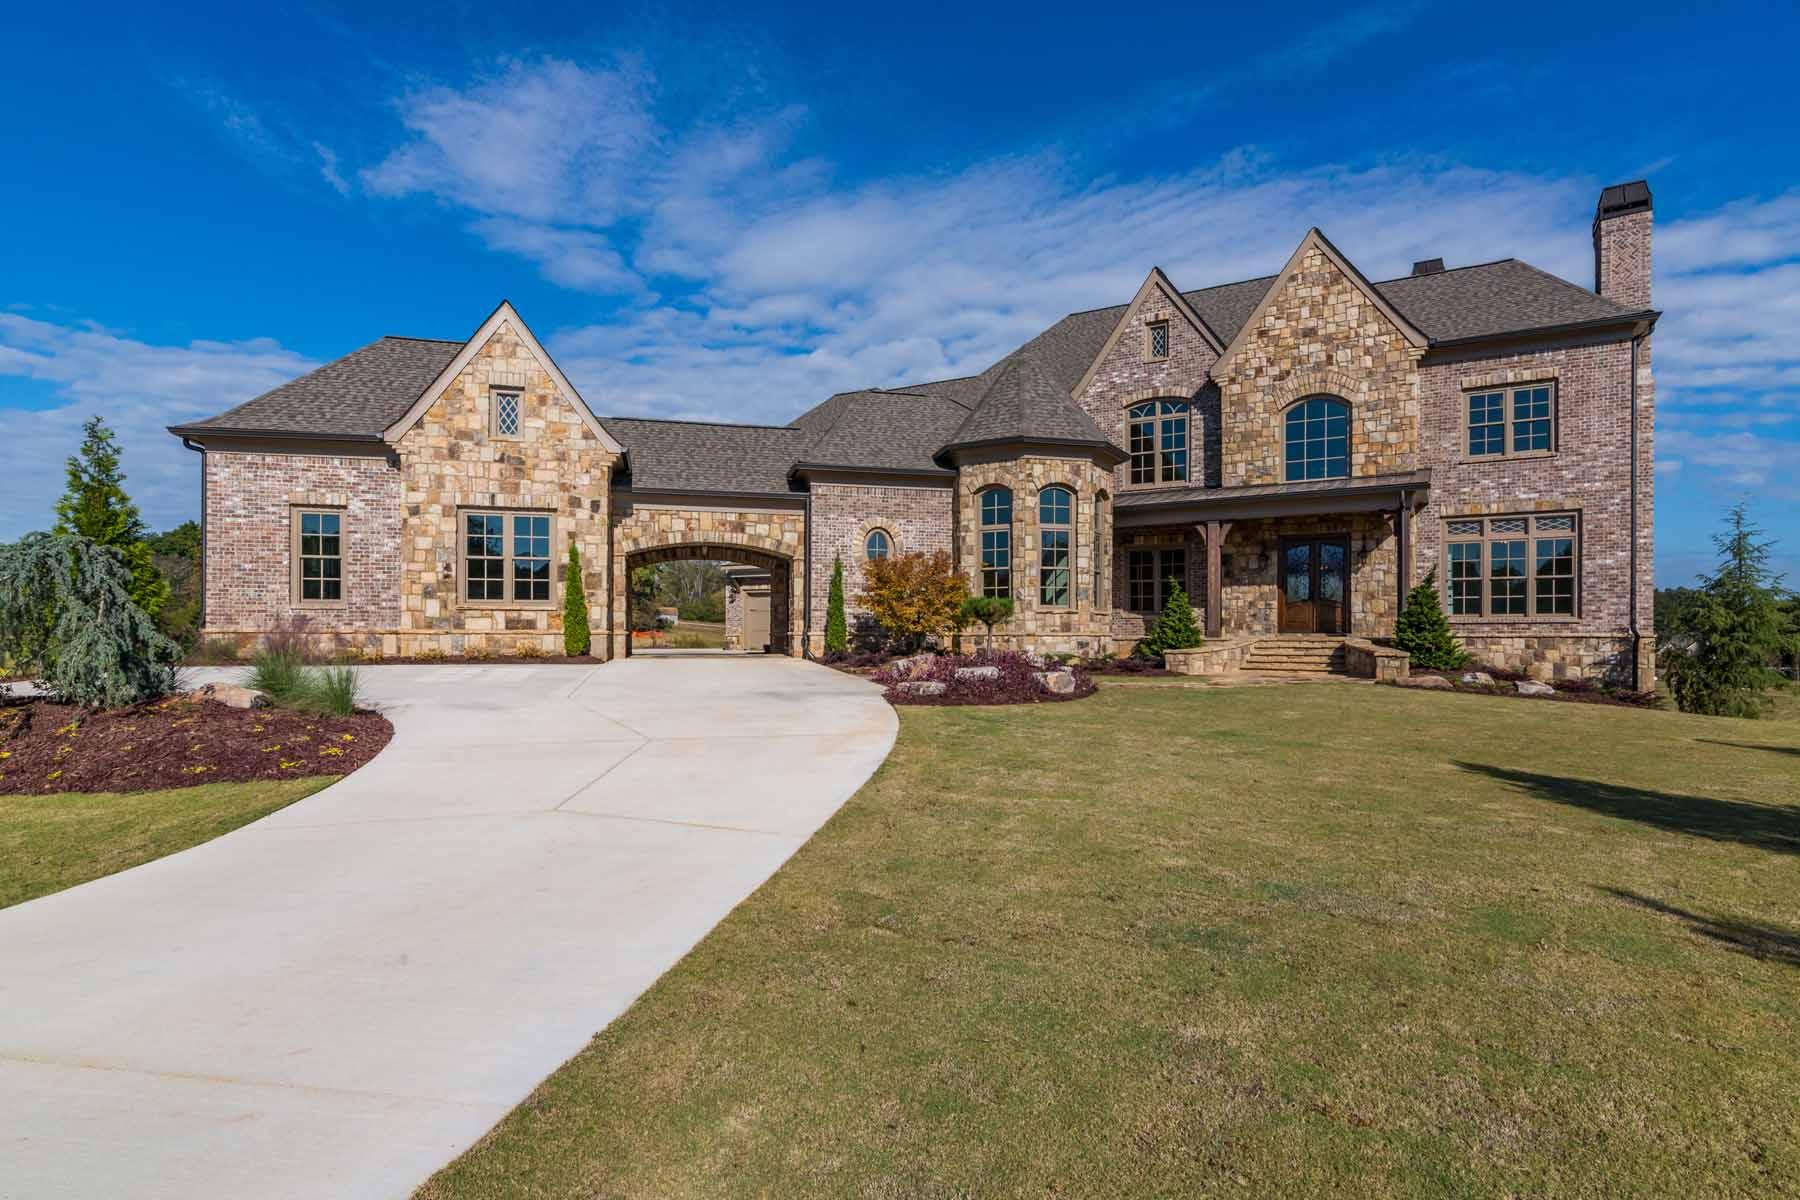 Single Family Home for Sale at Custom Luxury in Milton 10150 Cedar Ridge Drive Milton, Georgia, 30004 United States